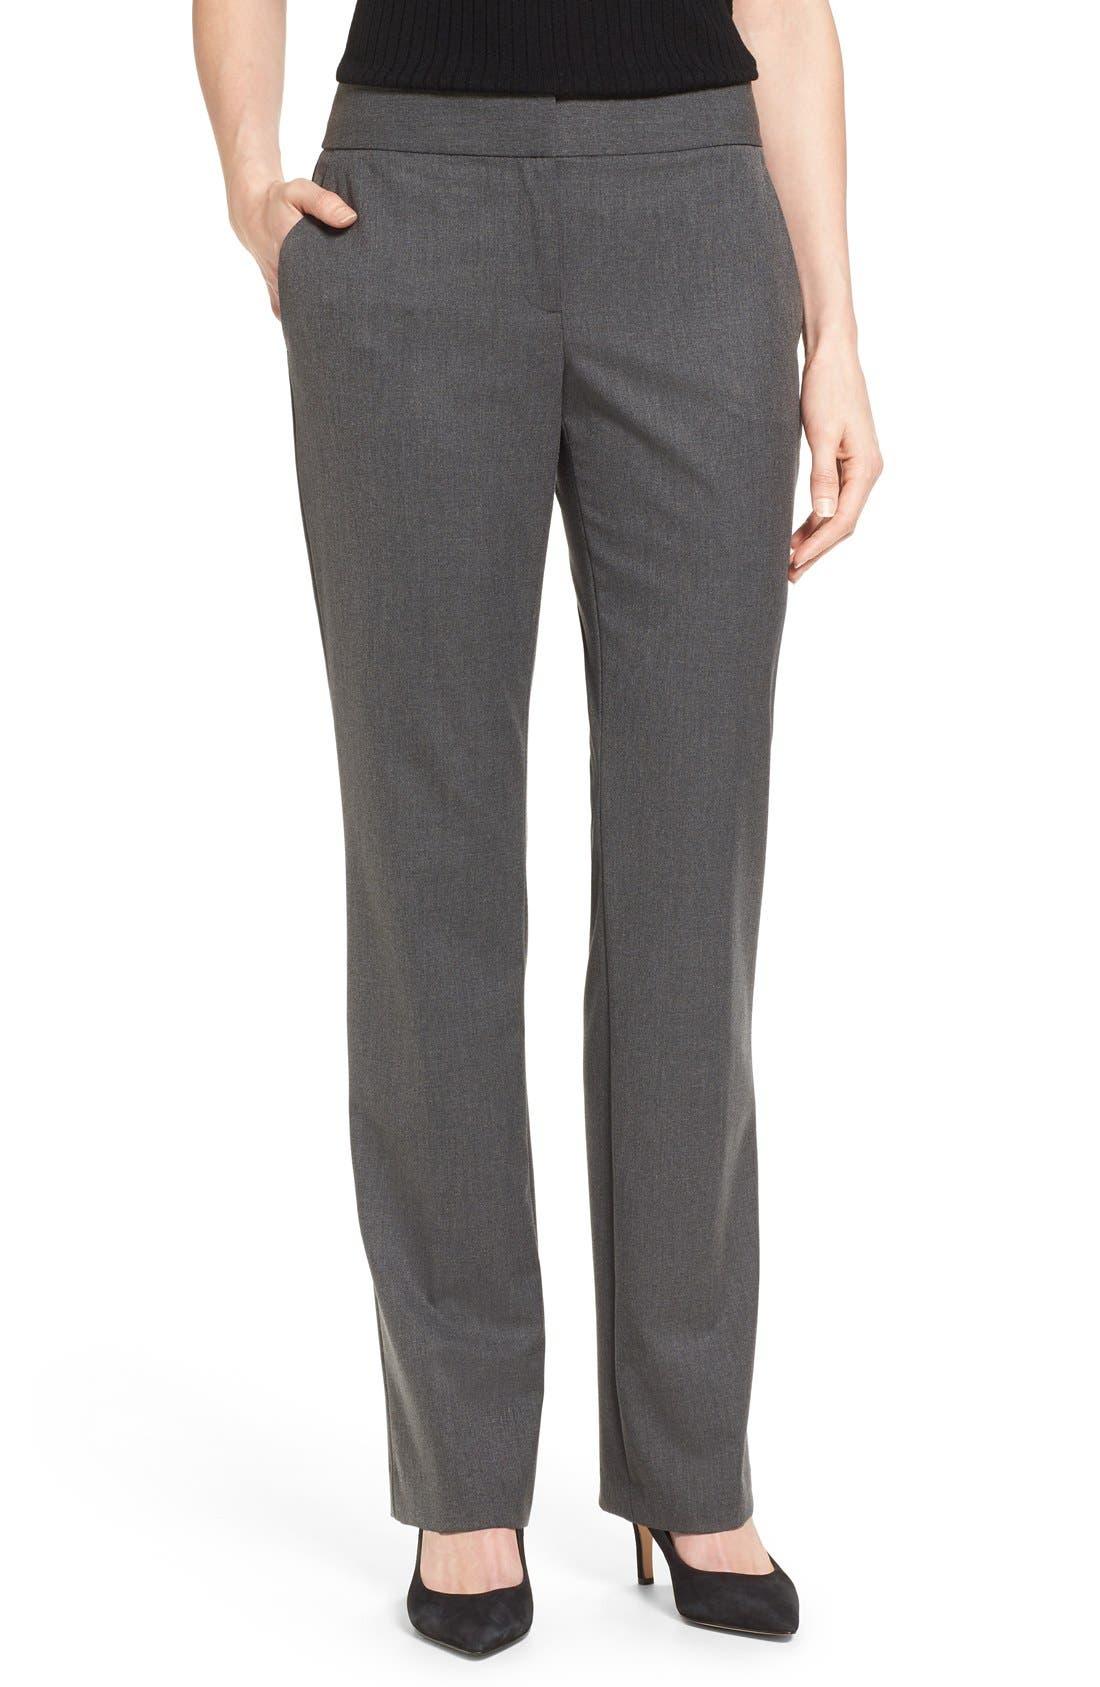 Alternate Image 1 Selected - Vince Camuto Straight Leg Pants (Regular & Petite)